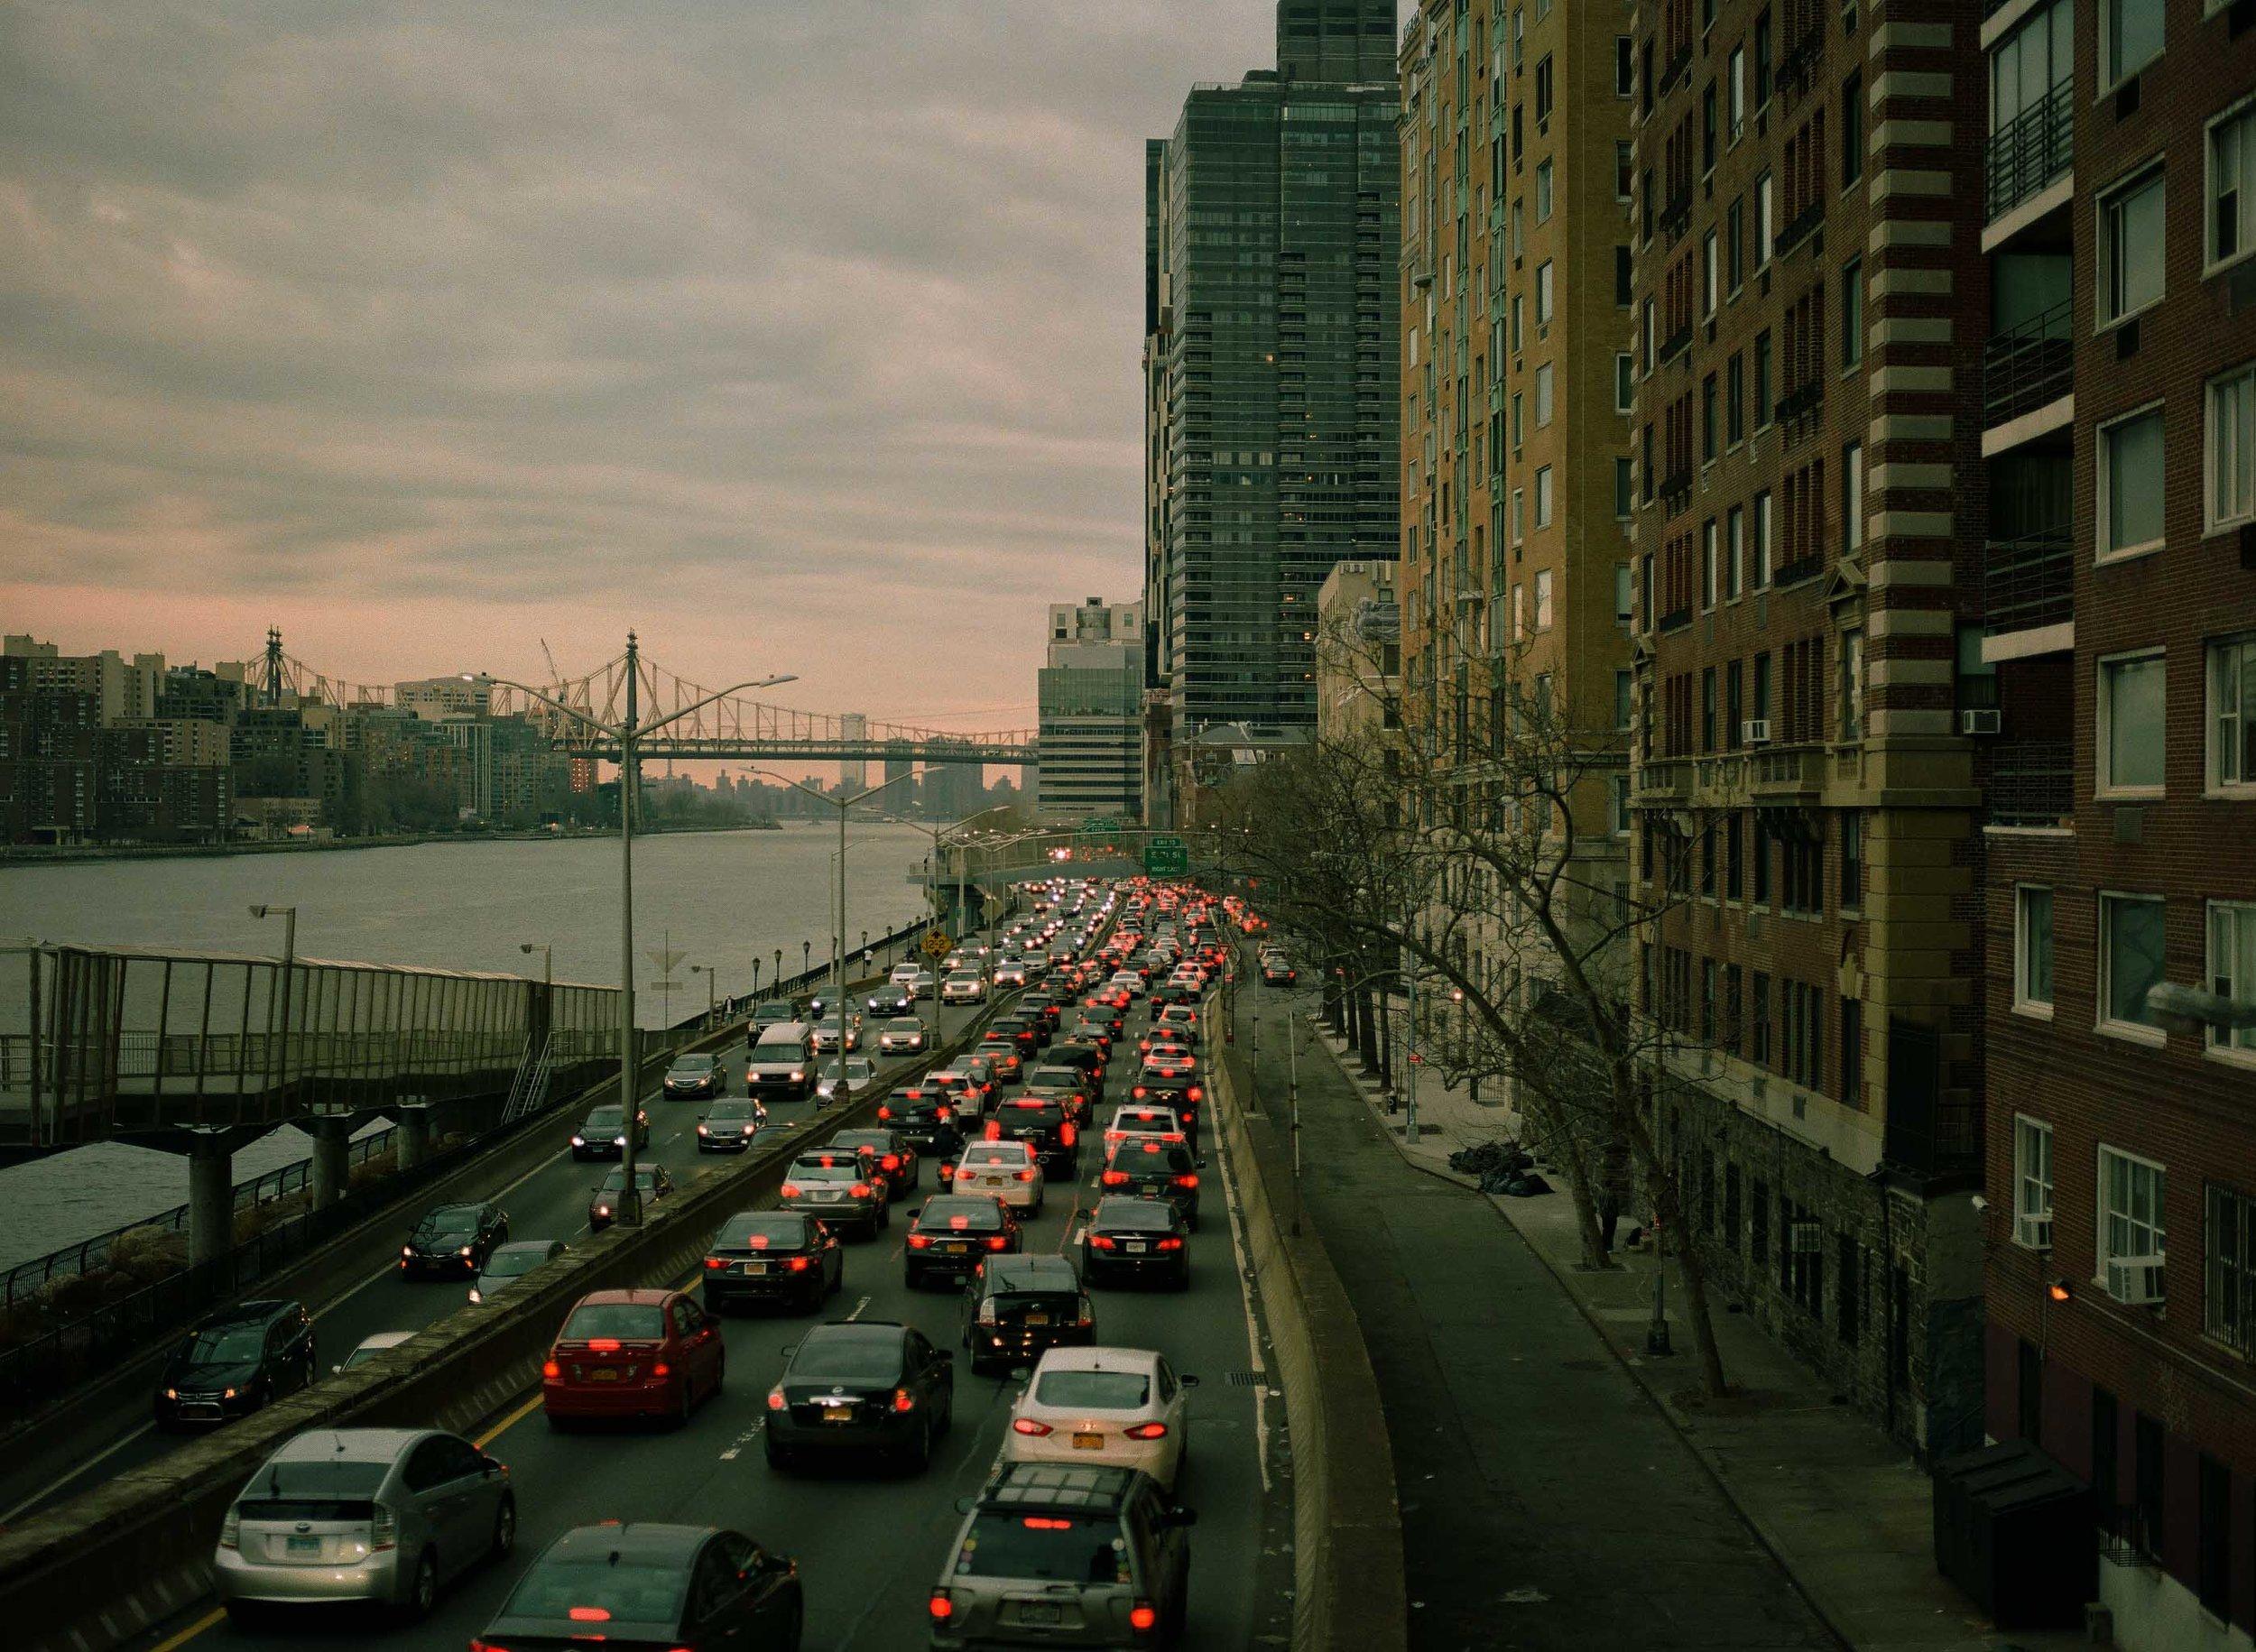 fdr traffic 120.jpg